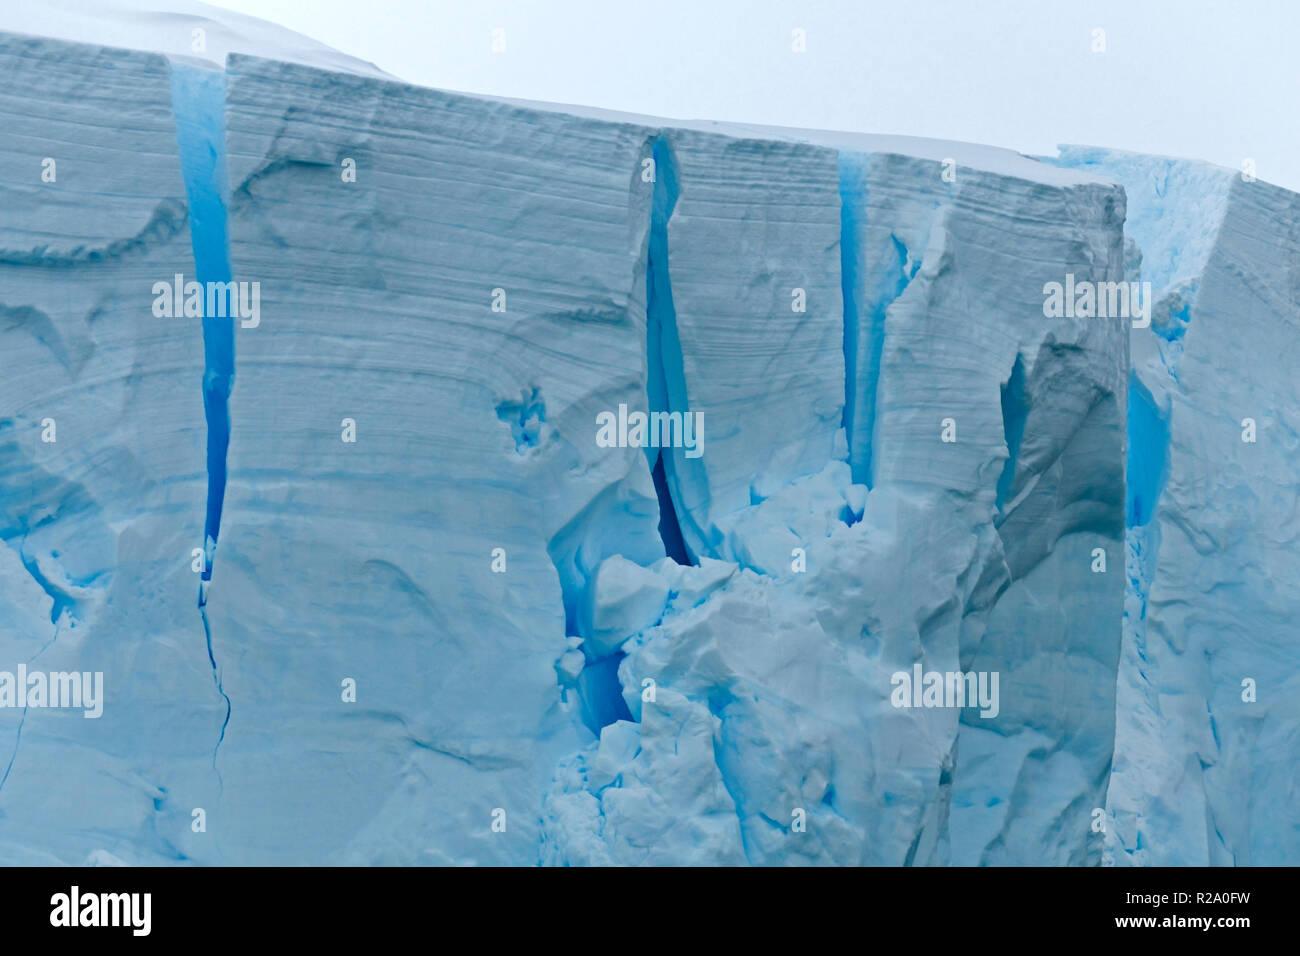 ice berg close up showing cracks and creates in ice antarctic peninsula antarctica - Stock Image